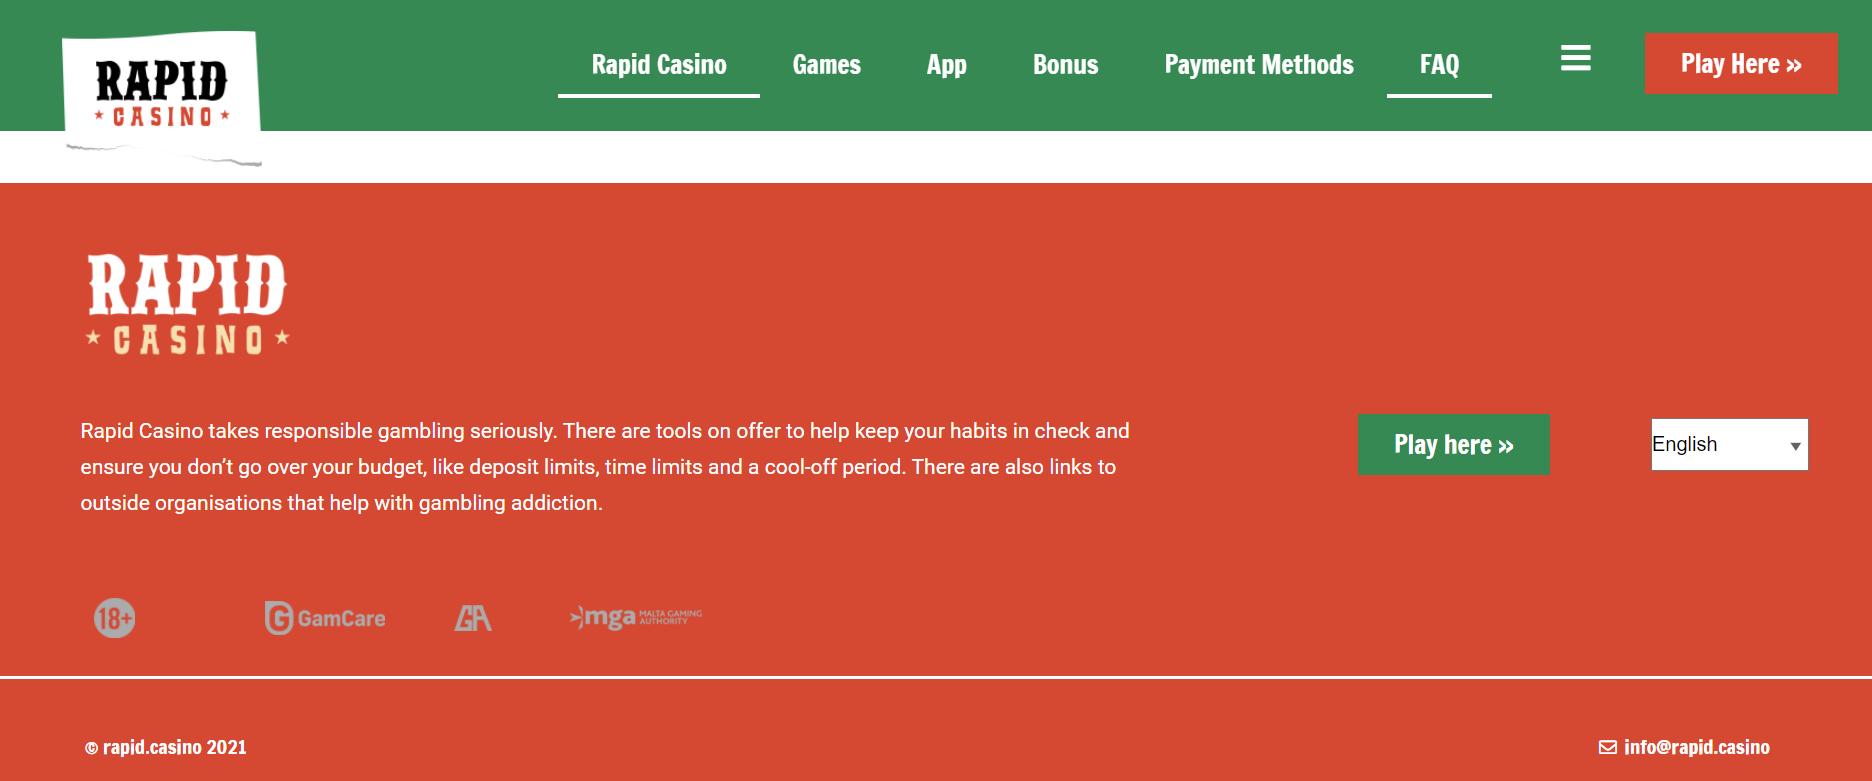 Casino Licence Rapid Casino